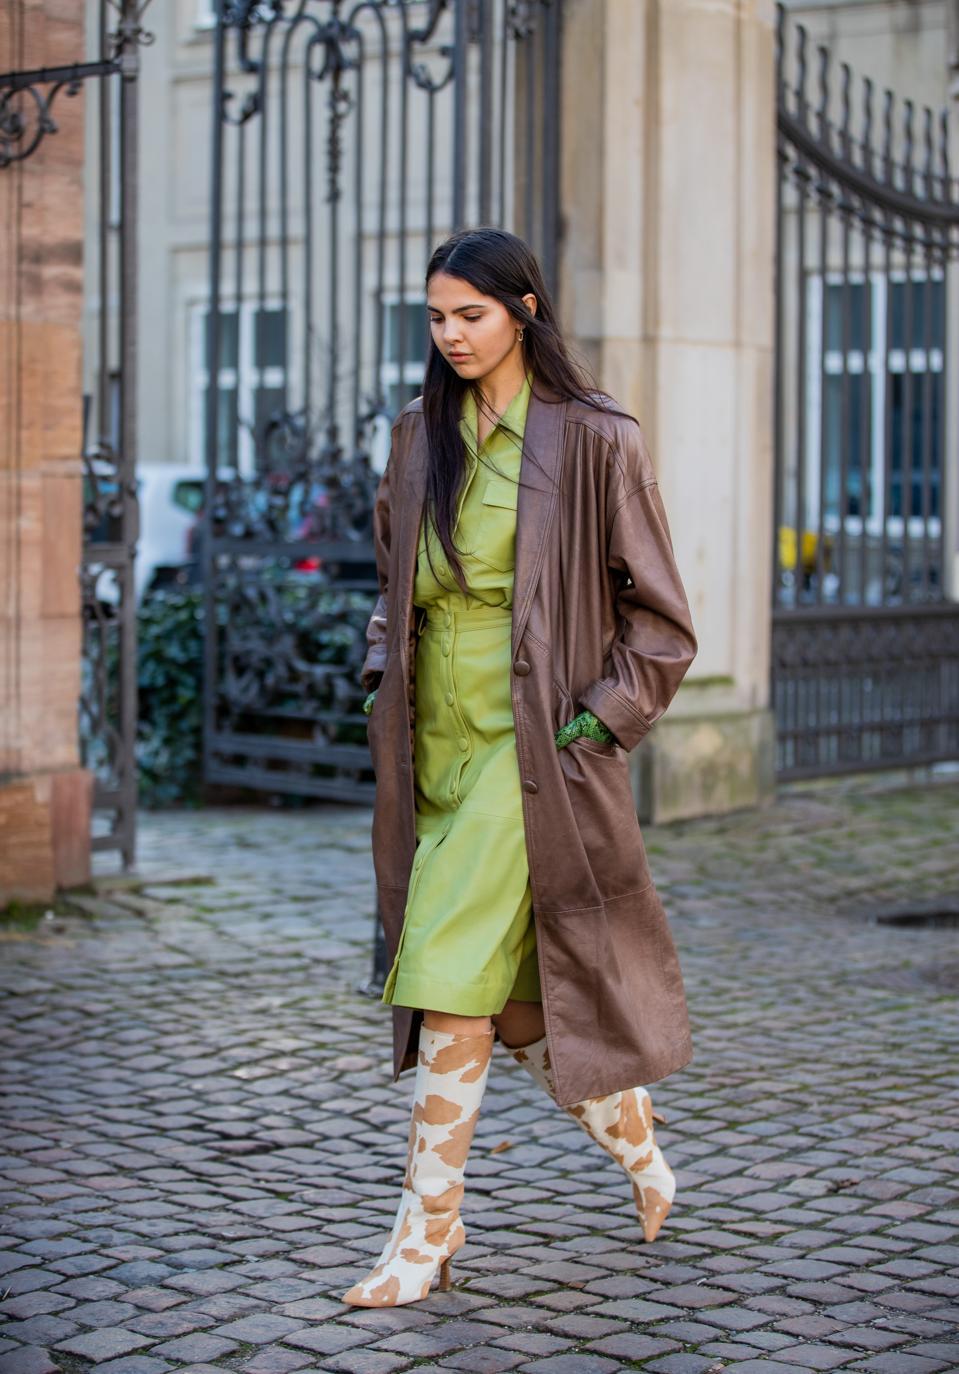 Street Style - Day 2 - Copenhagen Fashion Week Autumn/Winter 2020